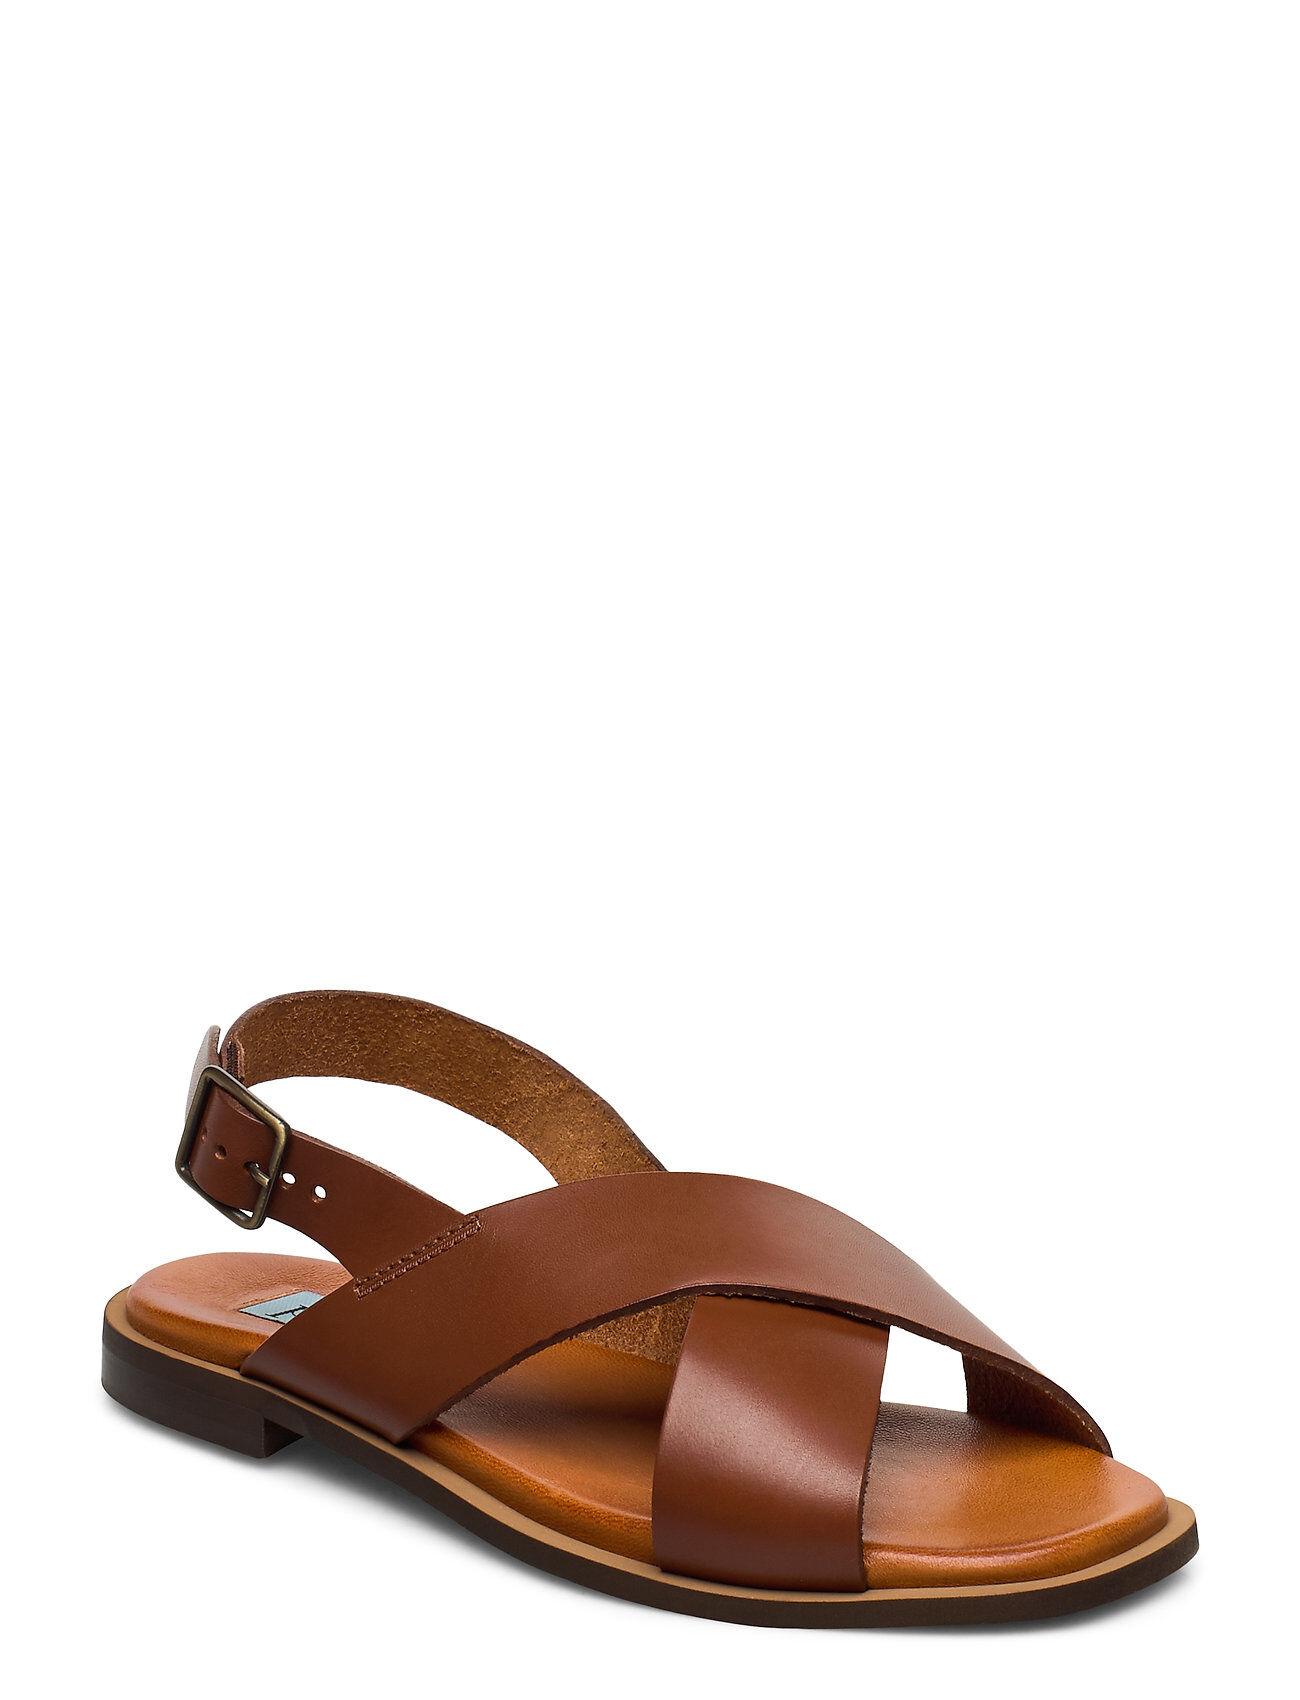 Apair Cross Classic Square Shoes Summer Shoes Flat Sandals Ruskea Apair